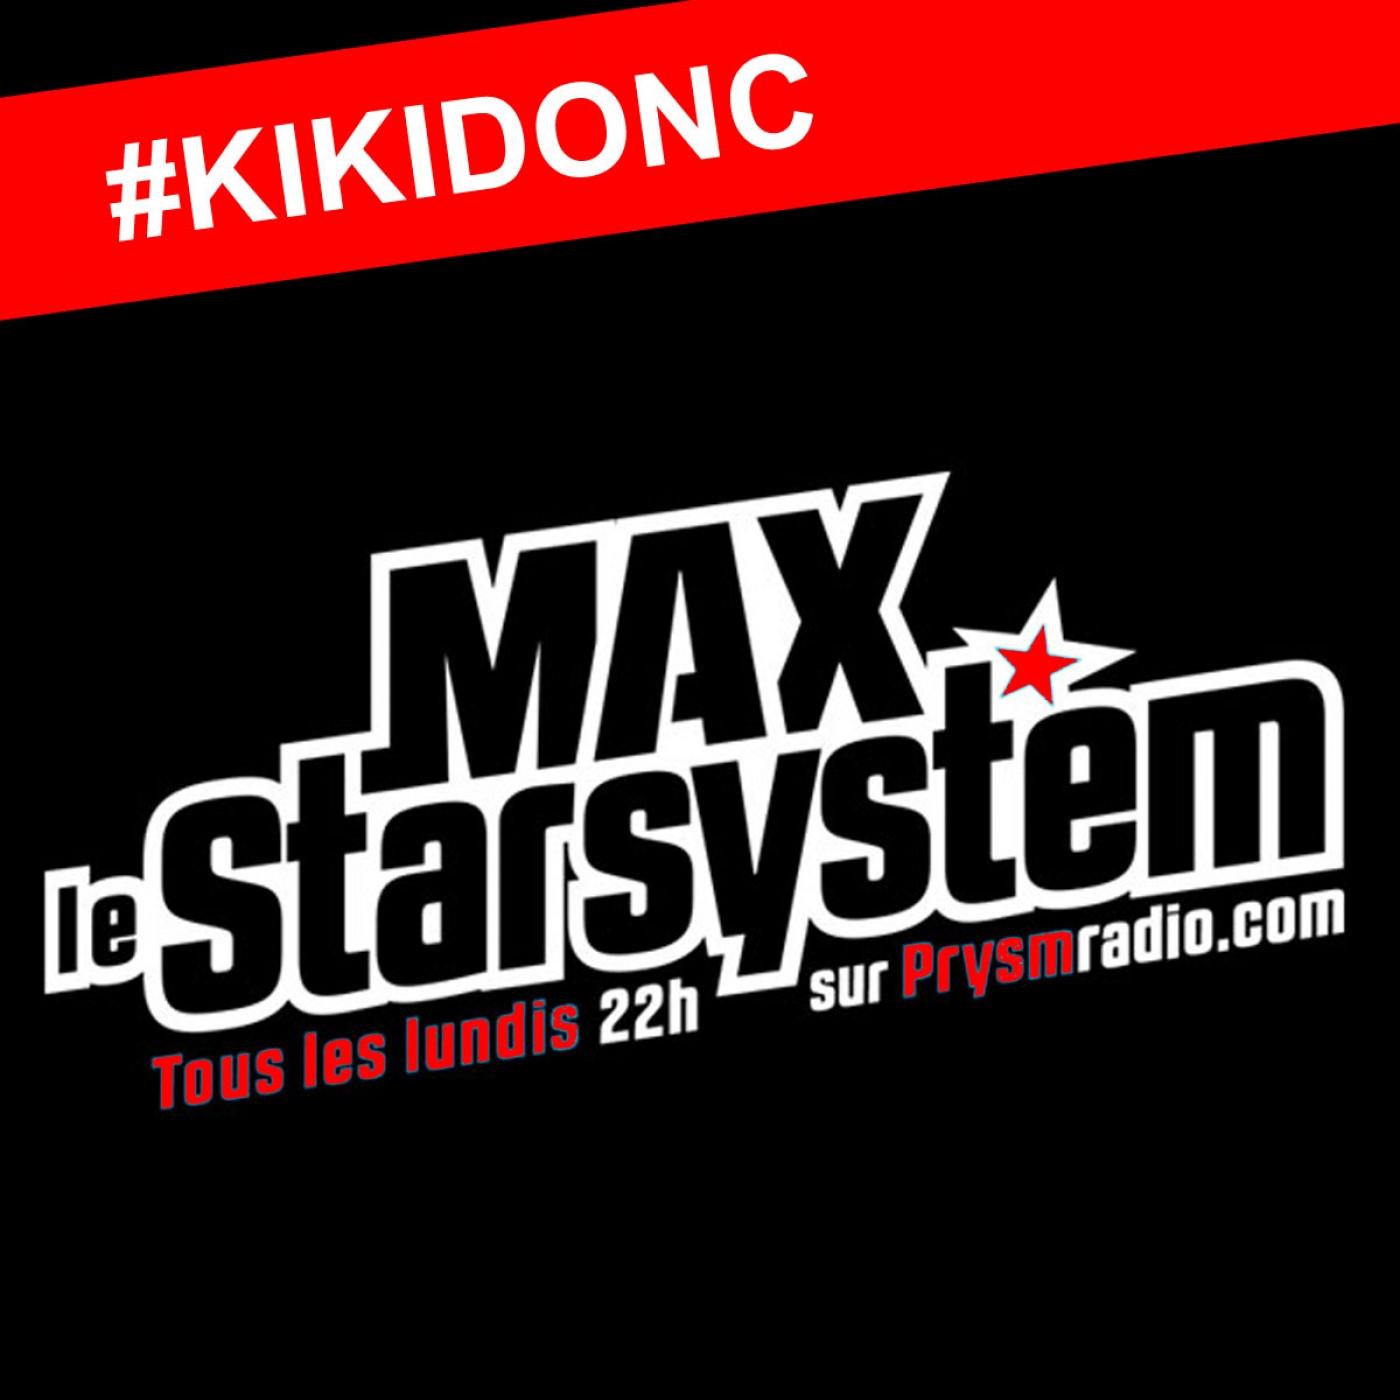 Les Kikidonc du Star System